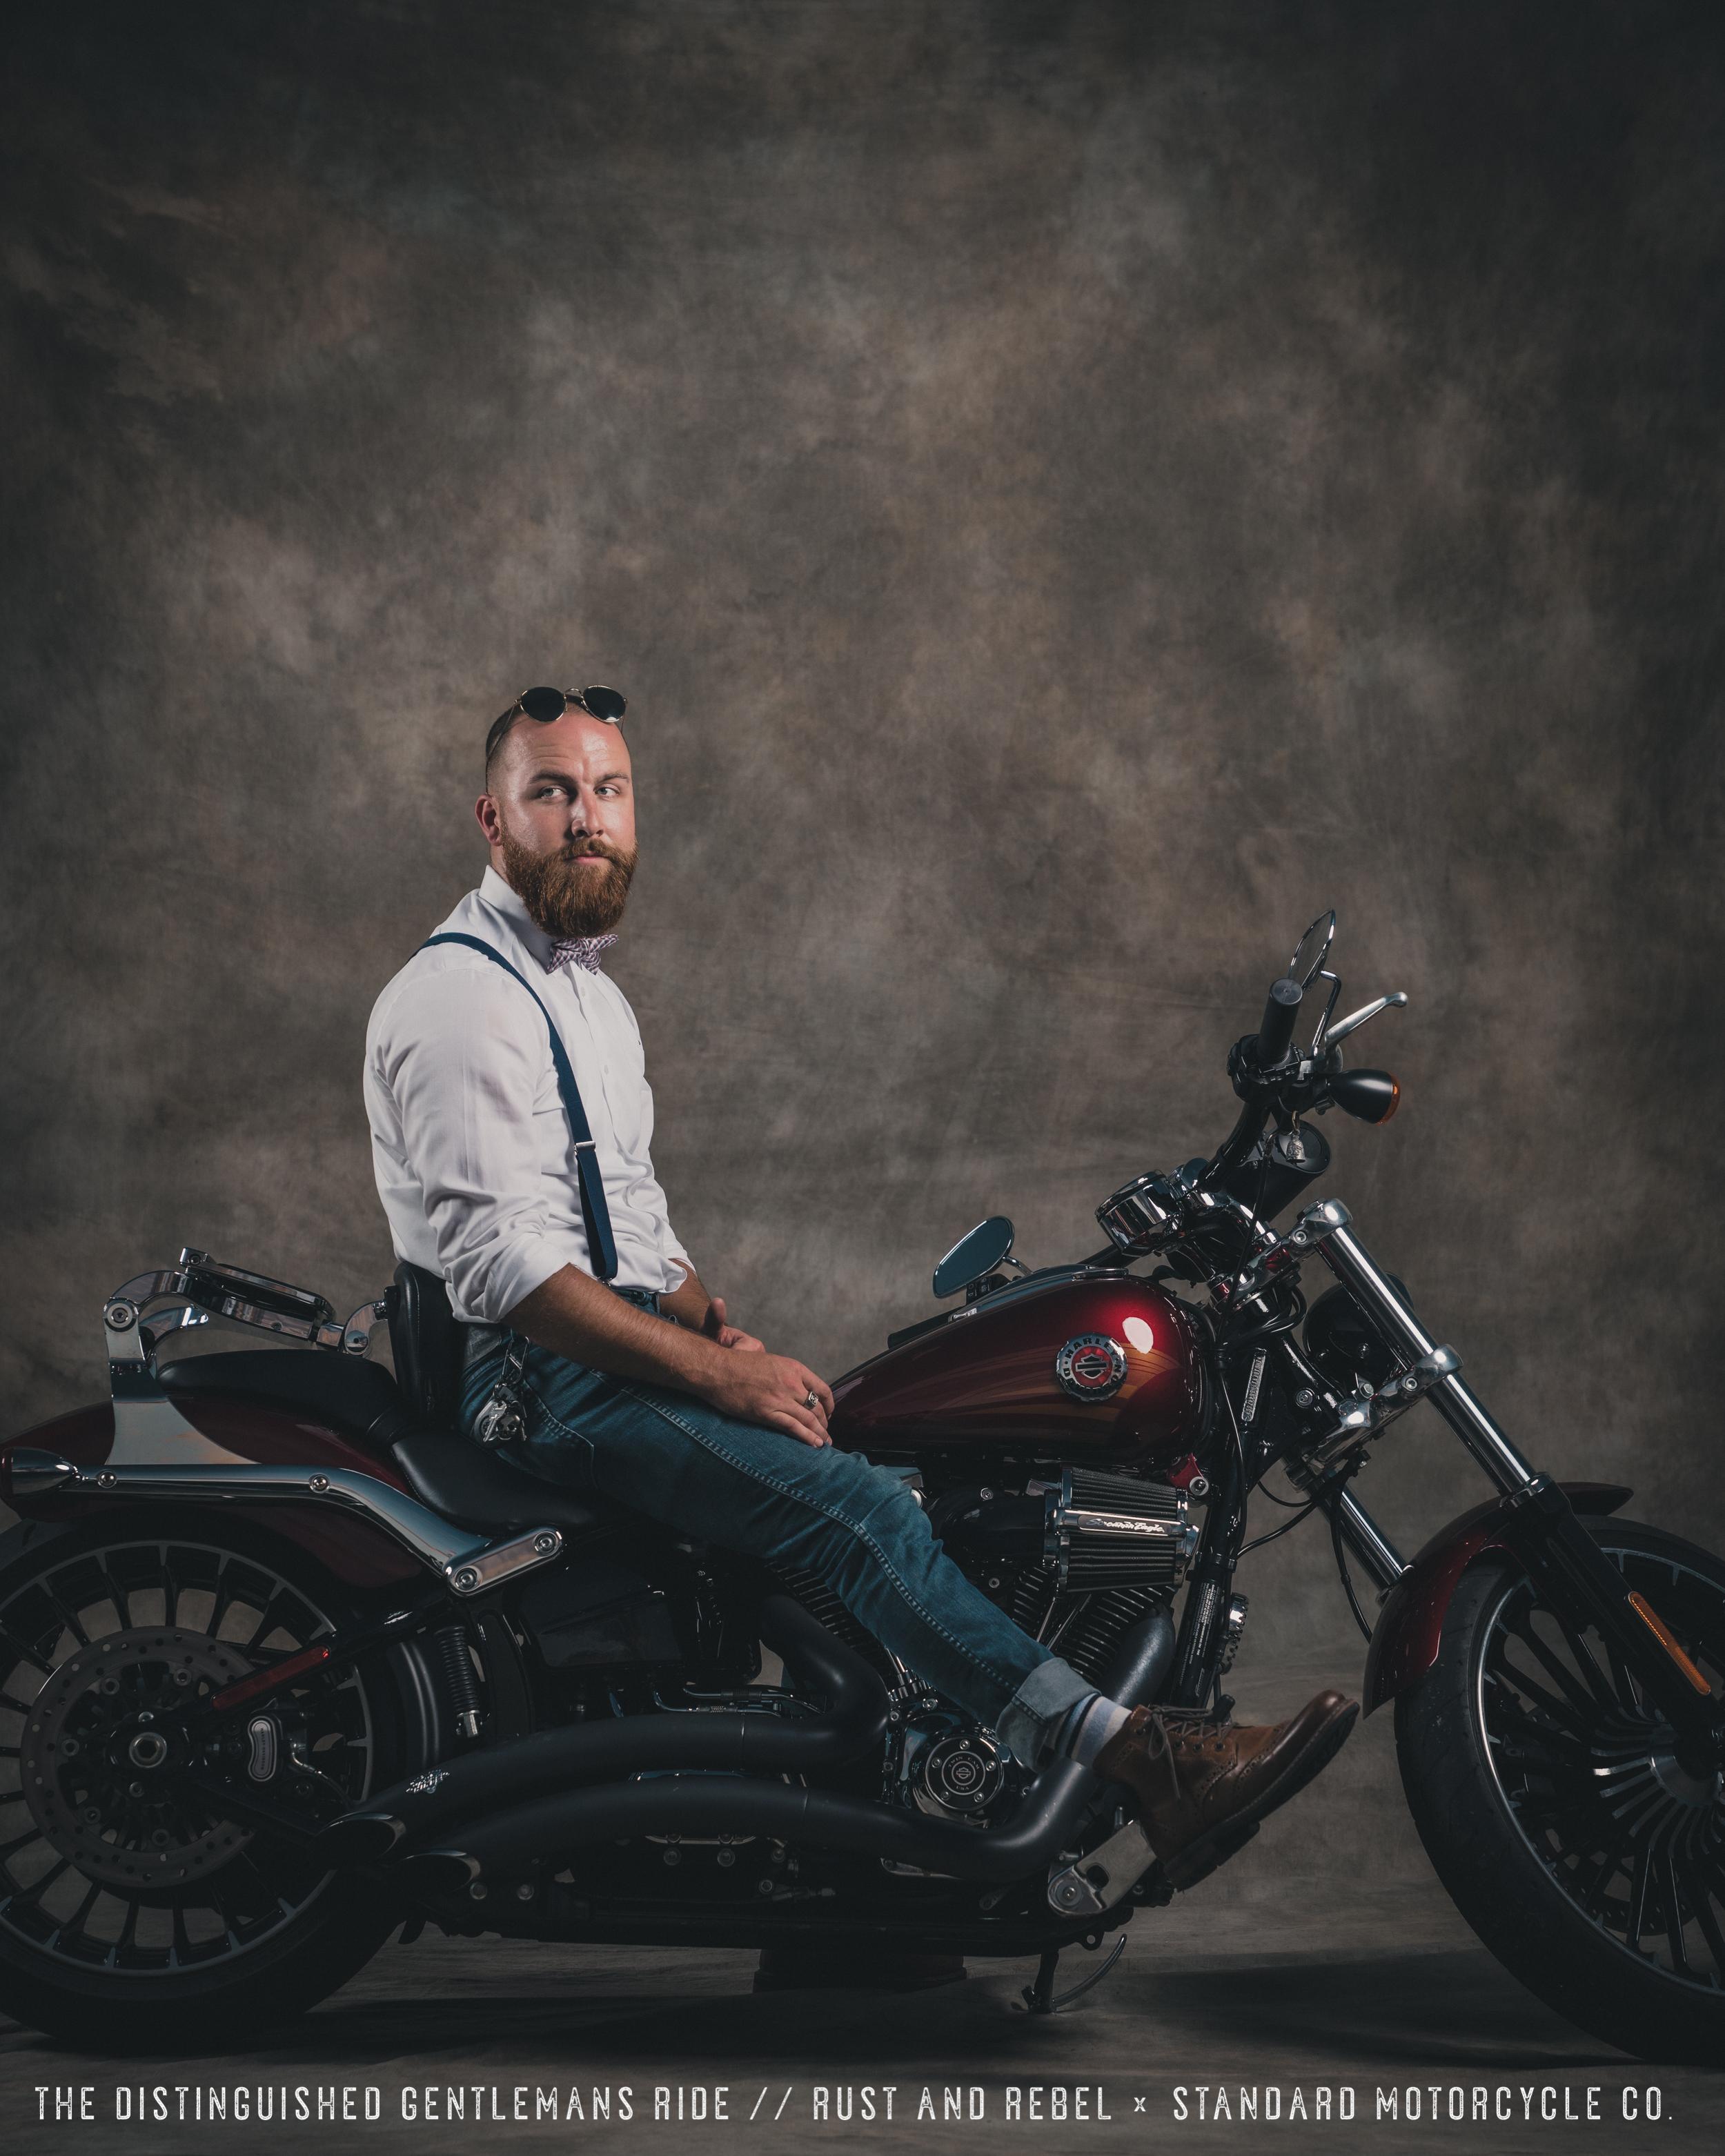 The Distinguished Gentleman's Ride 2019 [PEOPLE - PHOTO BY @MIKEDUNNUSA] - 0151.jpg